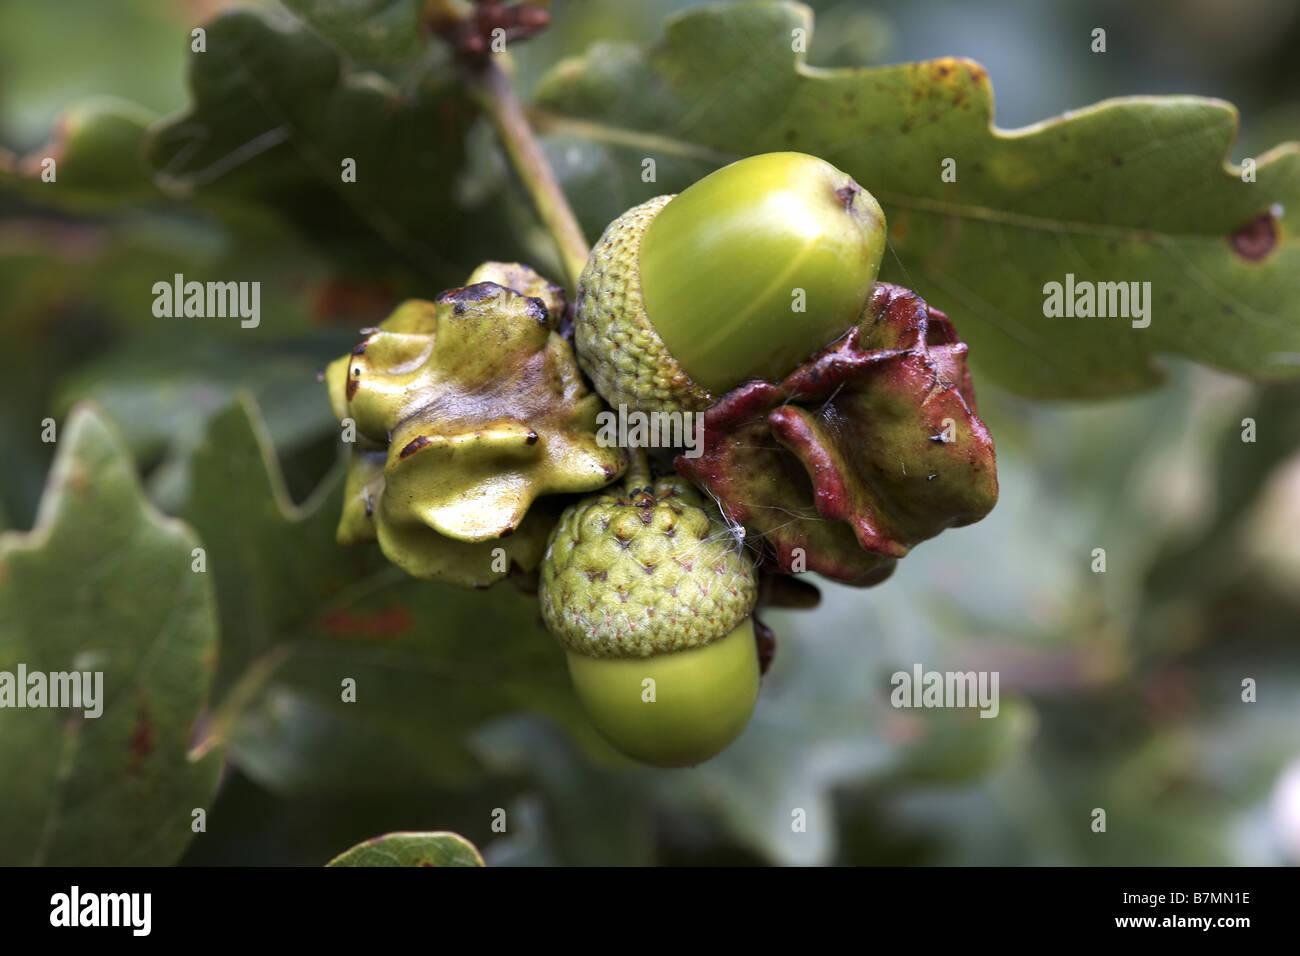 Oak Pest Stockfotos & Oak Pest Bilder - Alamy